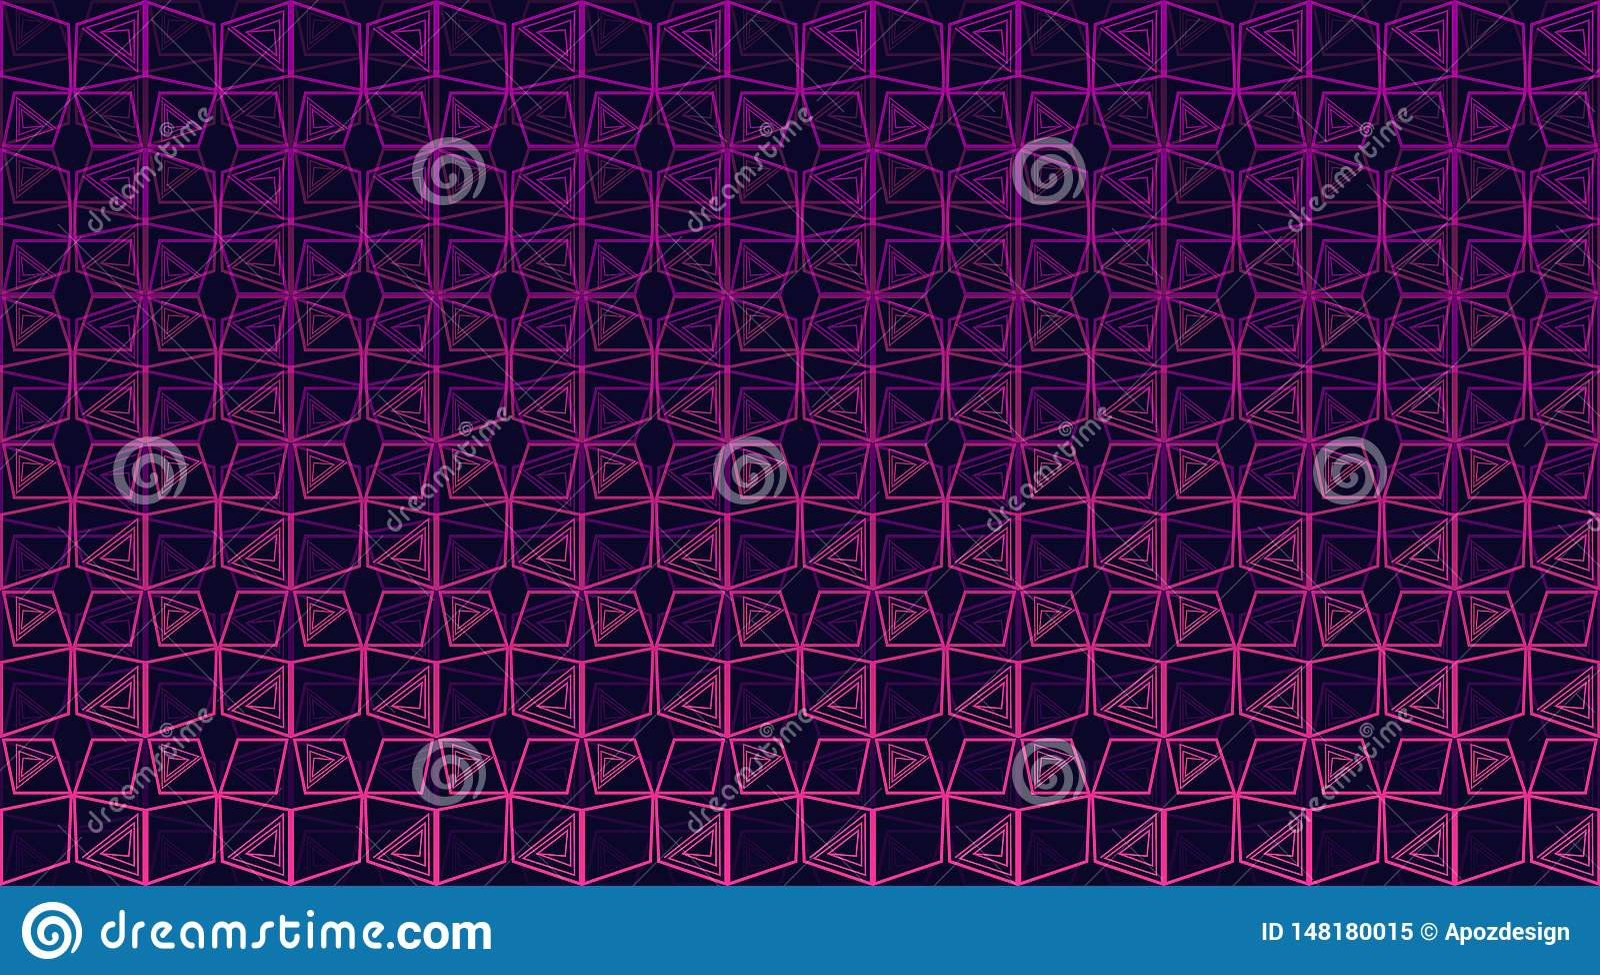 Sömlös flerfärgad geometrisk bakgrund